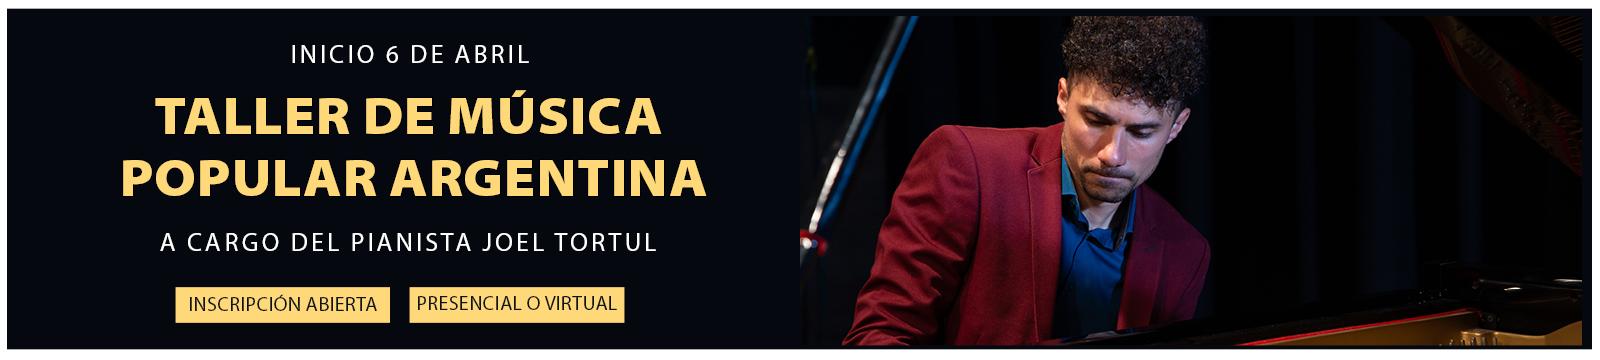 Taller de Música Popular Argentina